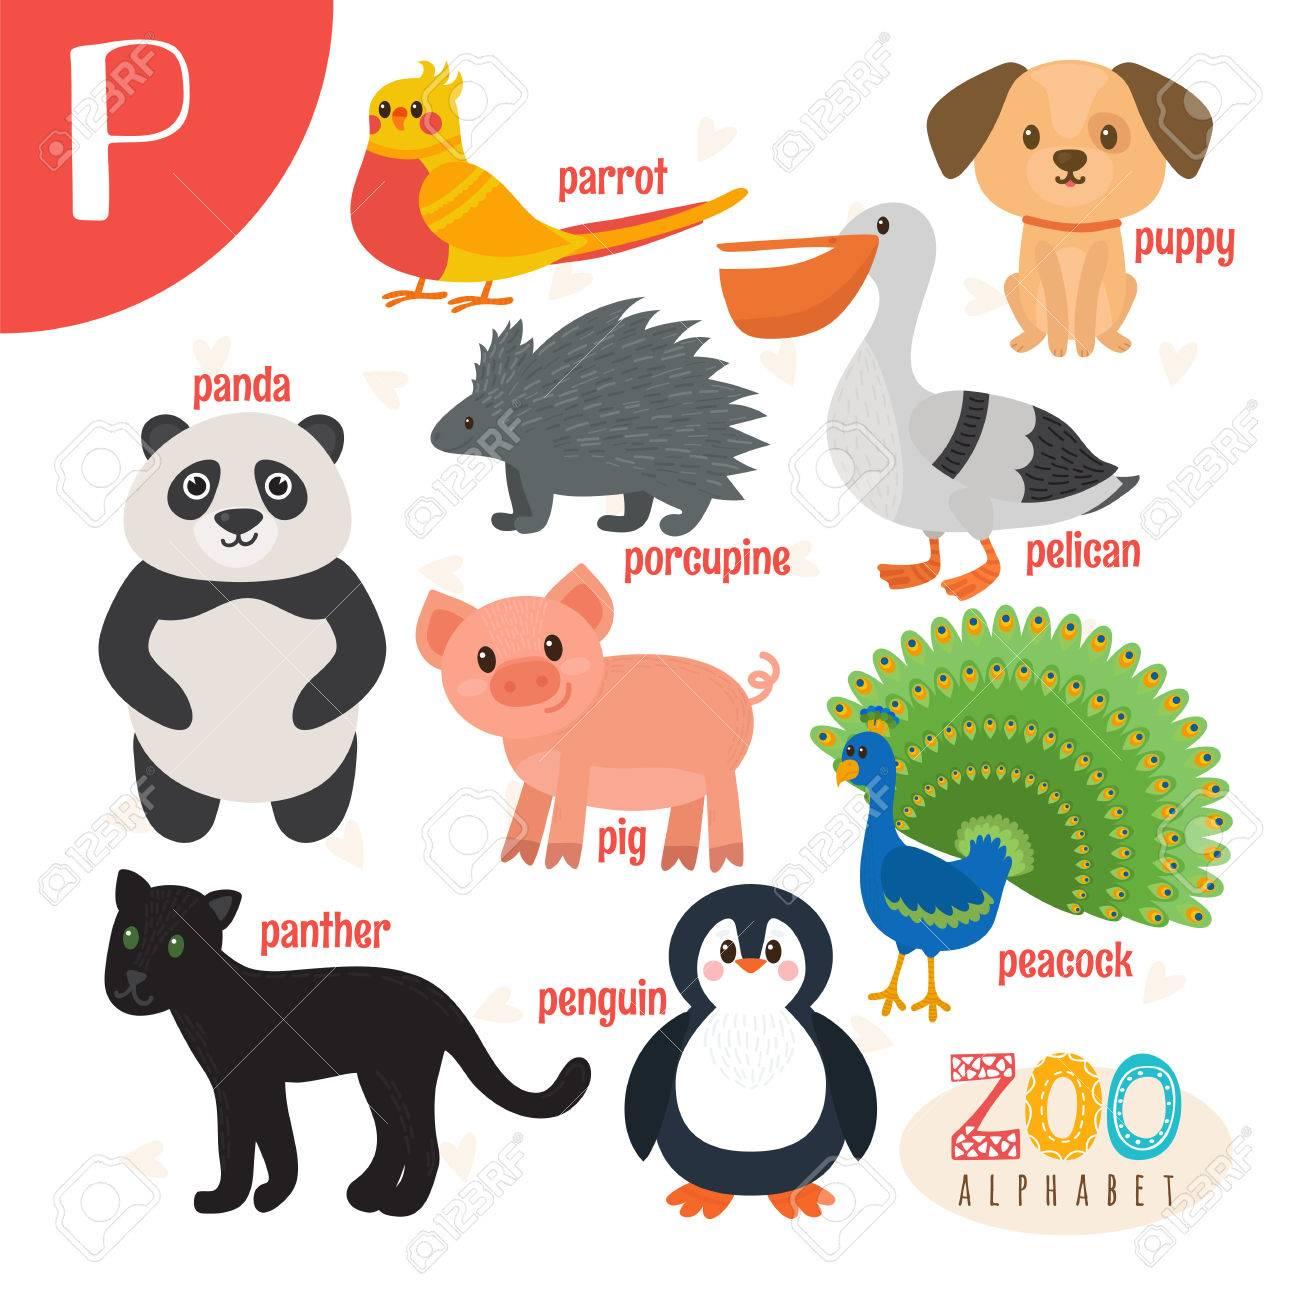 Letter P. Cute Animals. Funny Cartoon Animals ABC Book